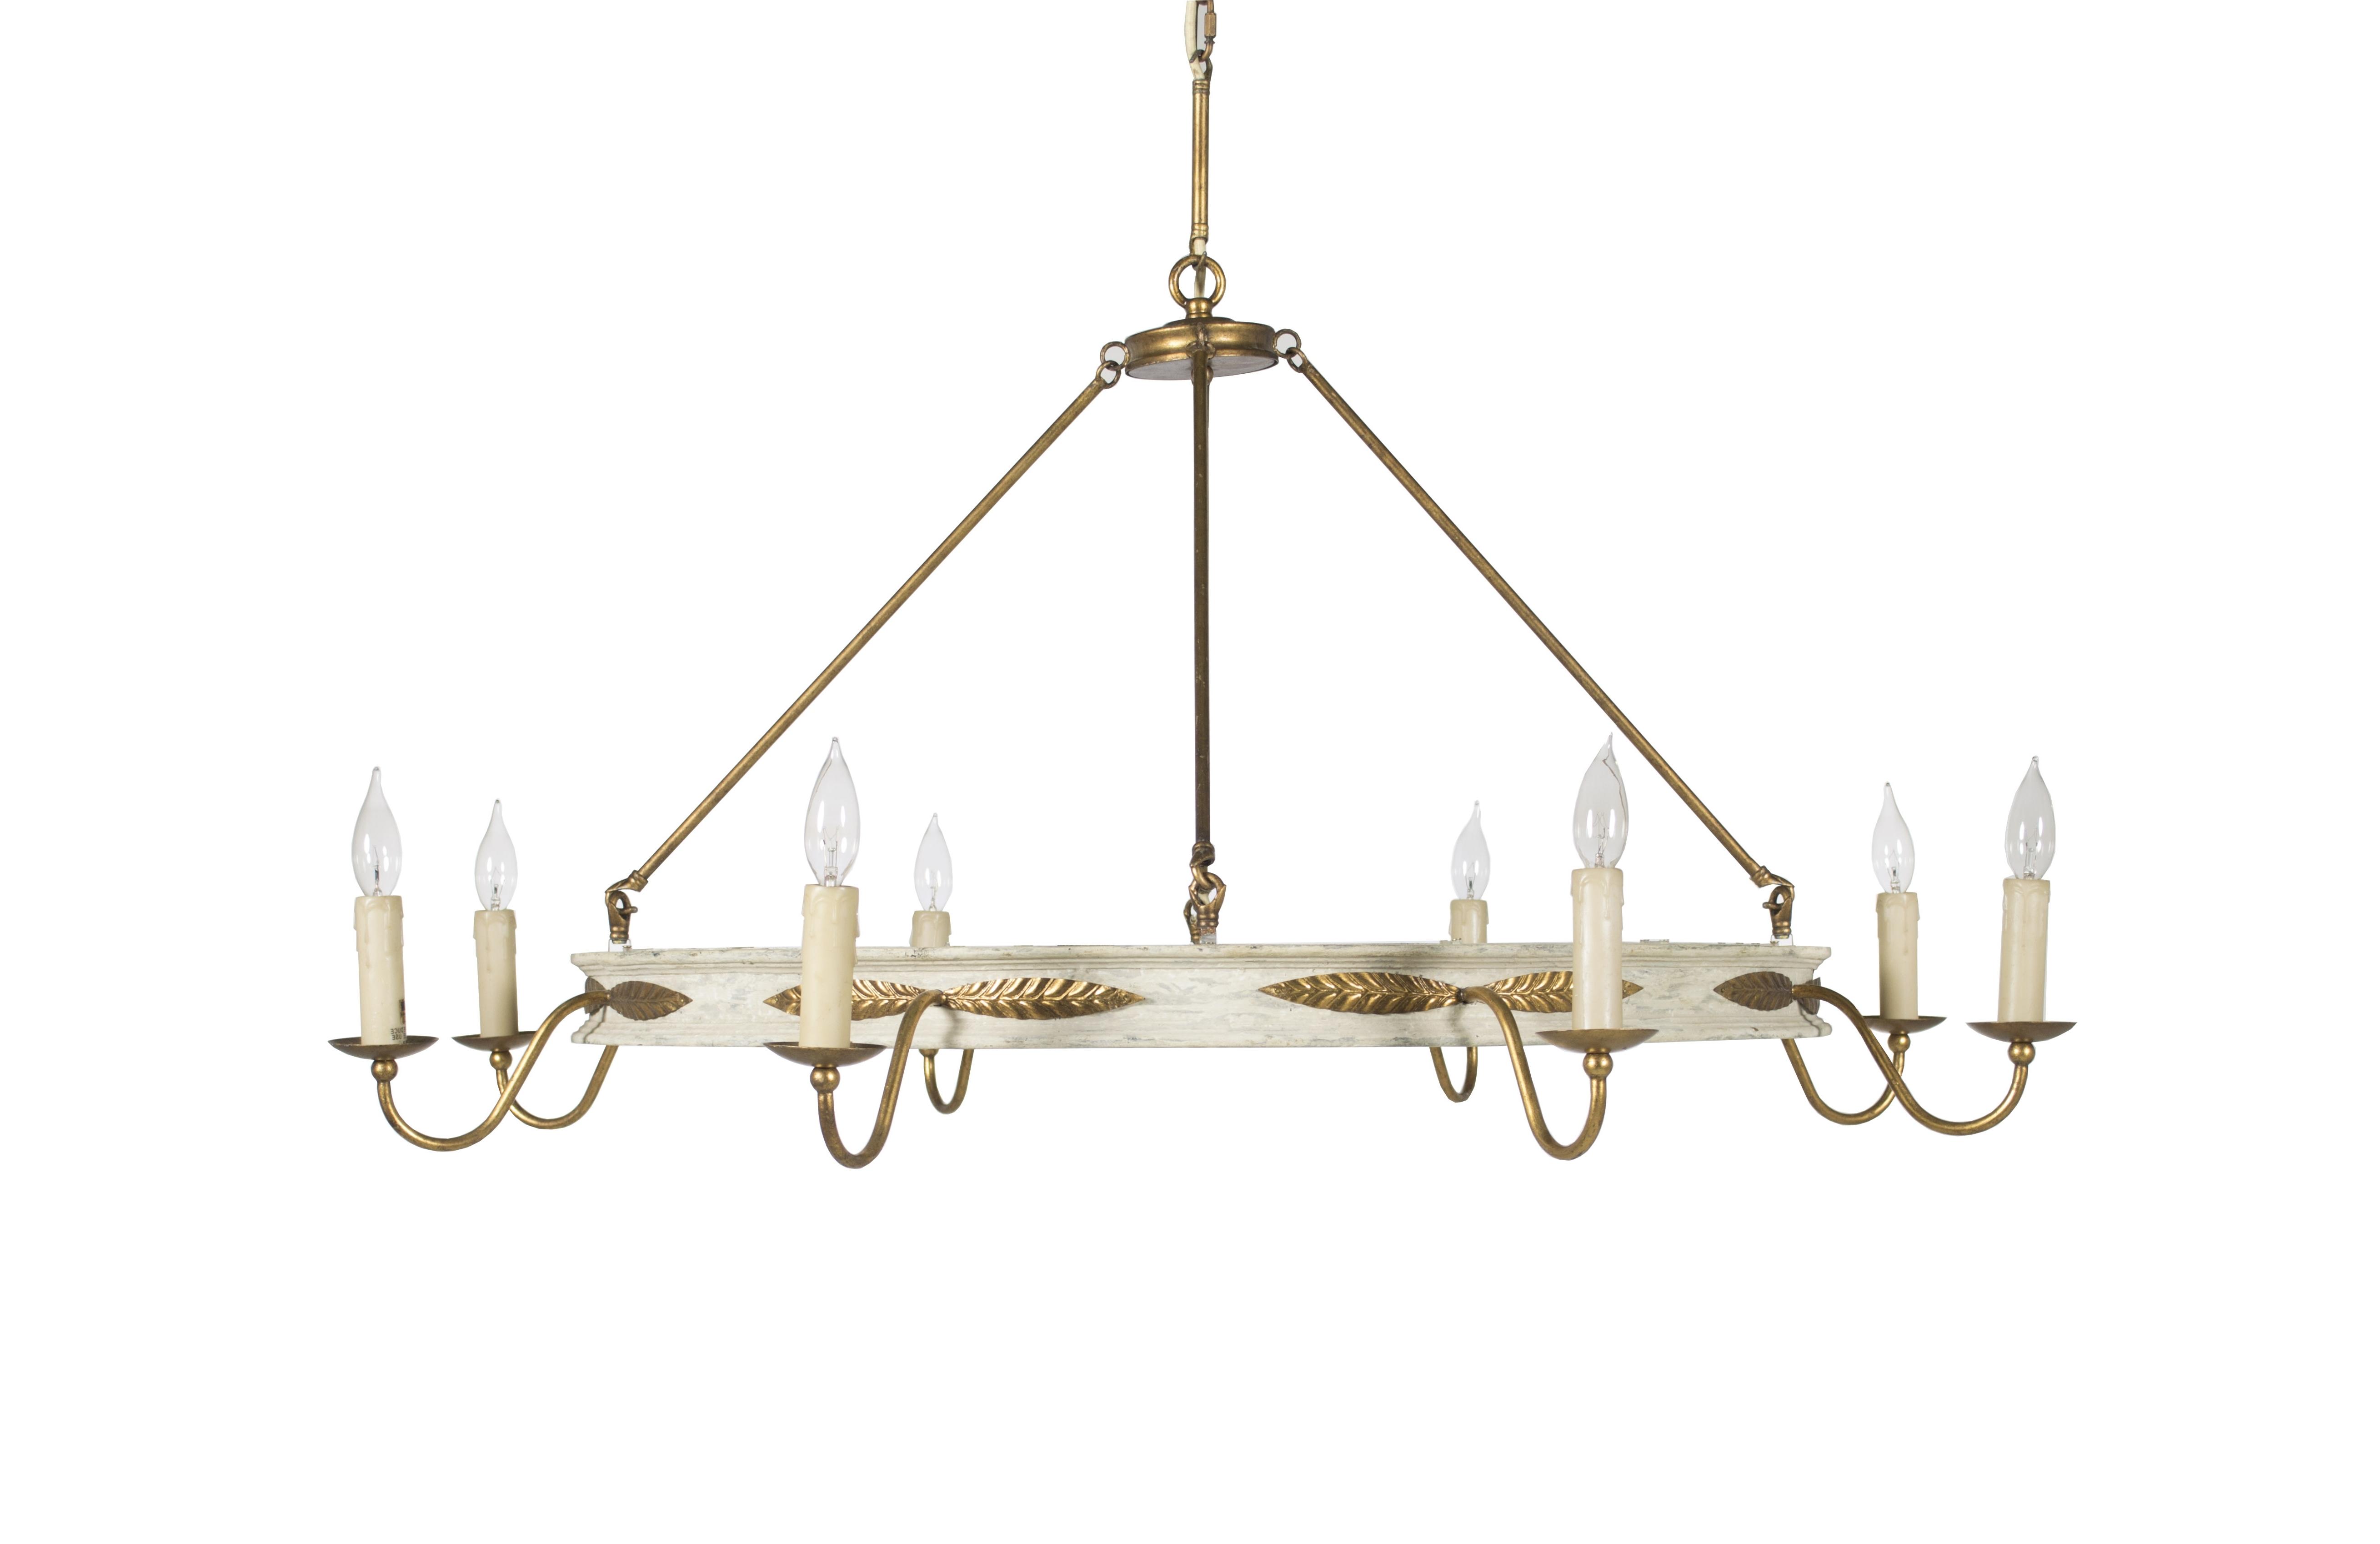 Antique Lighting Chandeliers (View 3 of 20)